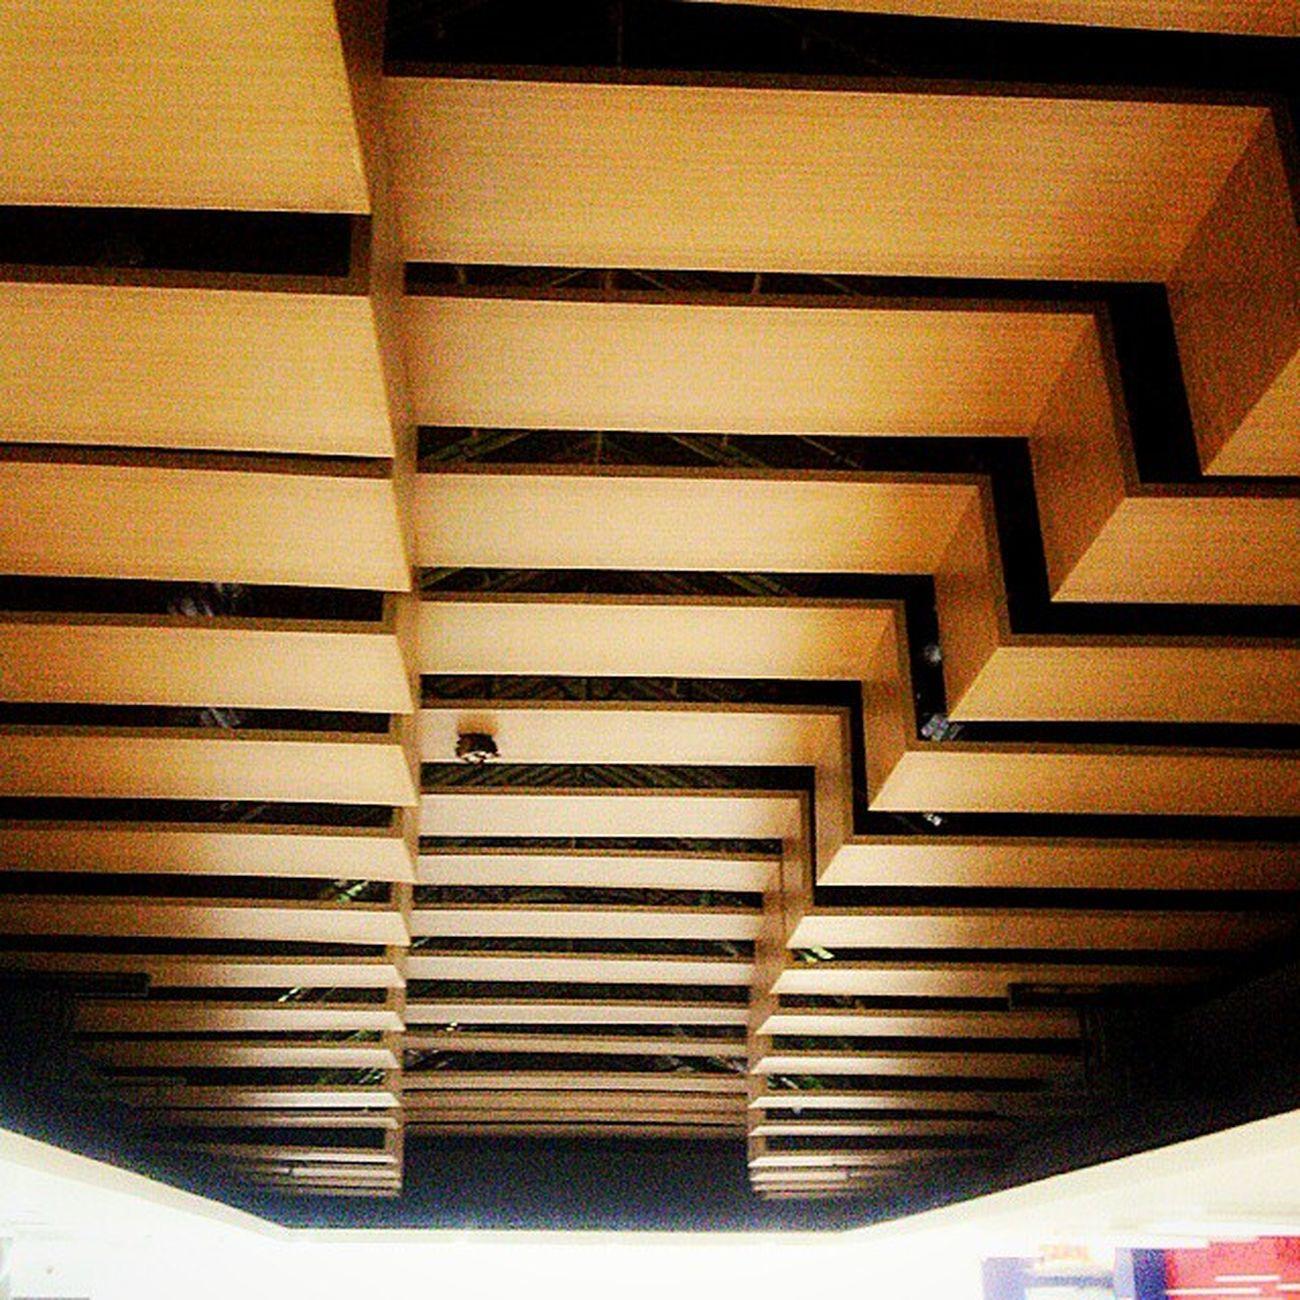 Ceiling Woods Renovations Plaza 3rdfloor justashot latepost